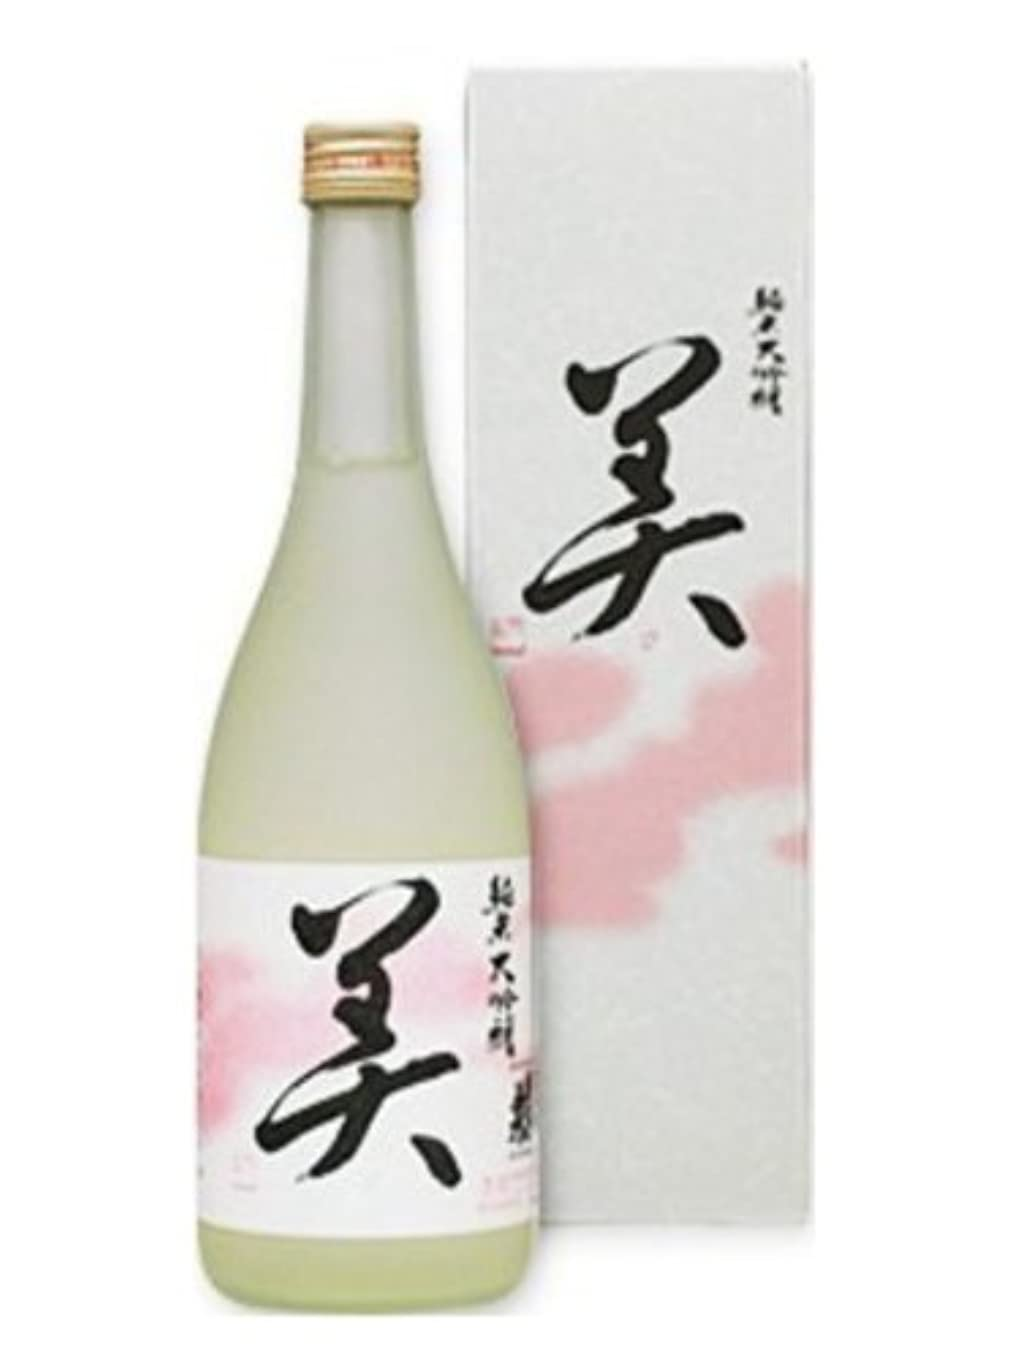 機構ジャーナル公使館蓬莱泉 美 純米大吟醸 720ml 関谷醸造(箱入り)